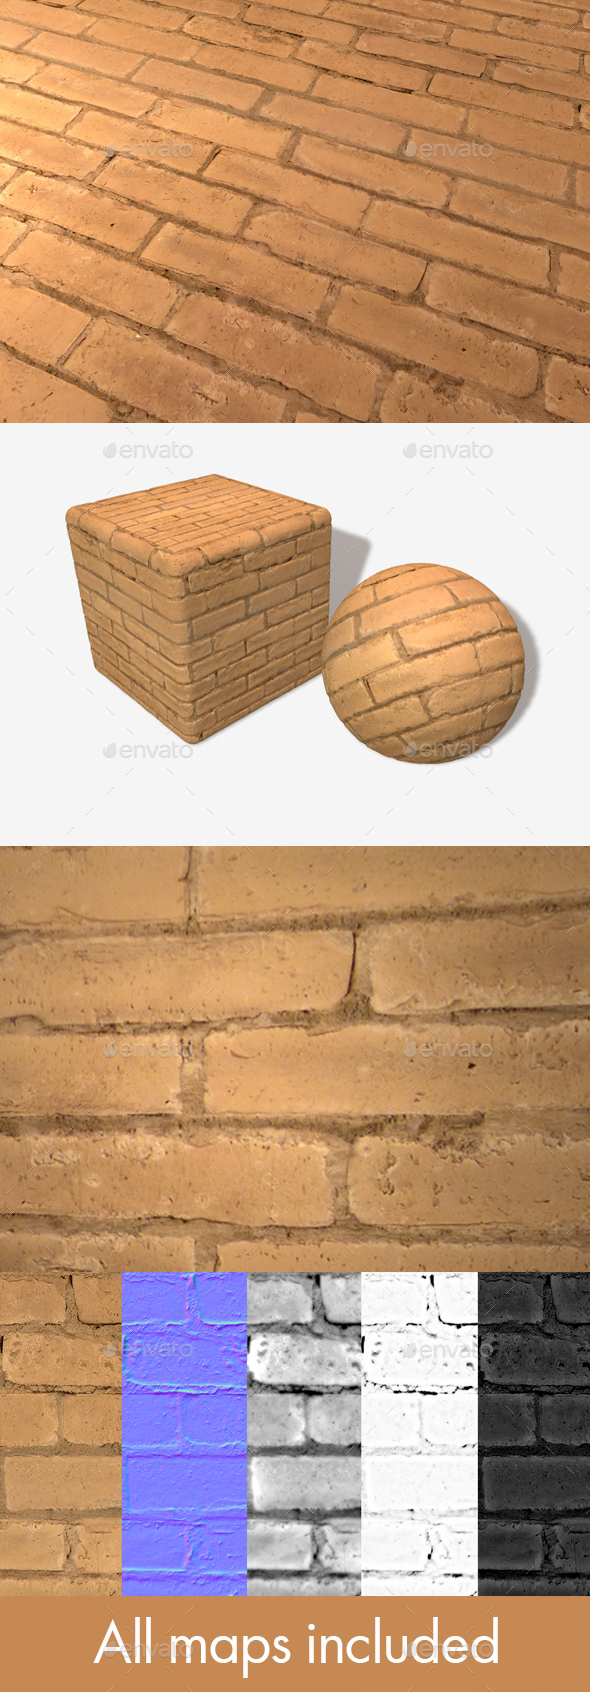 3DOcean Painted Orange Bricks Seamless Texture 20032628